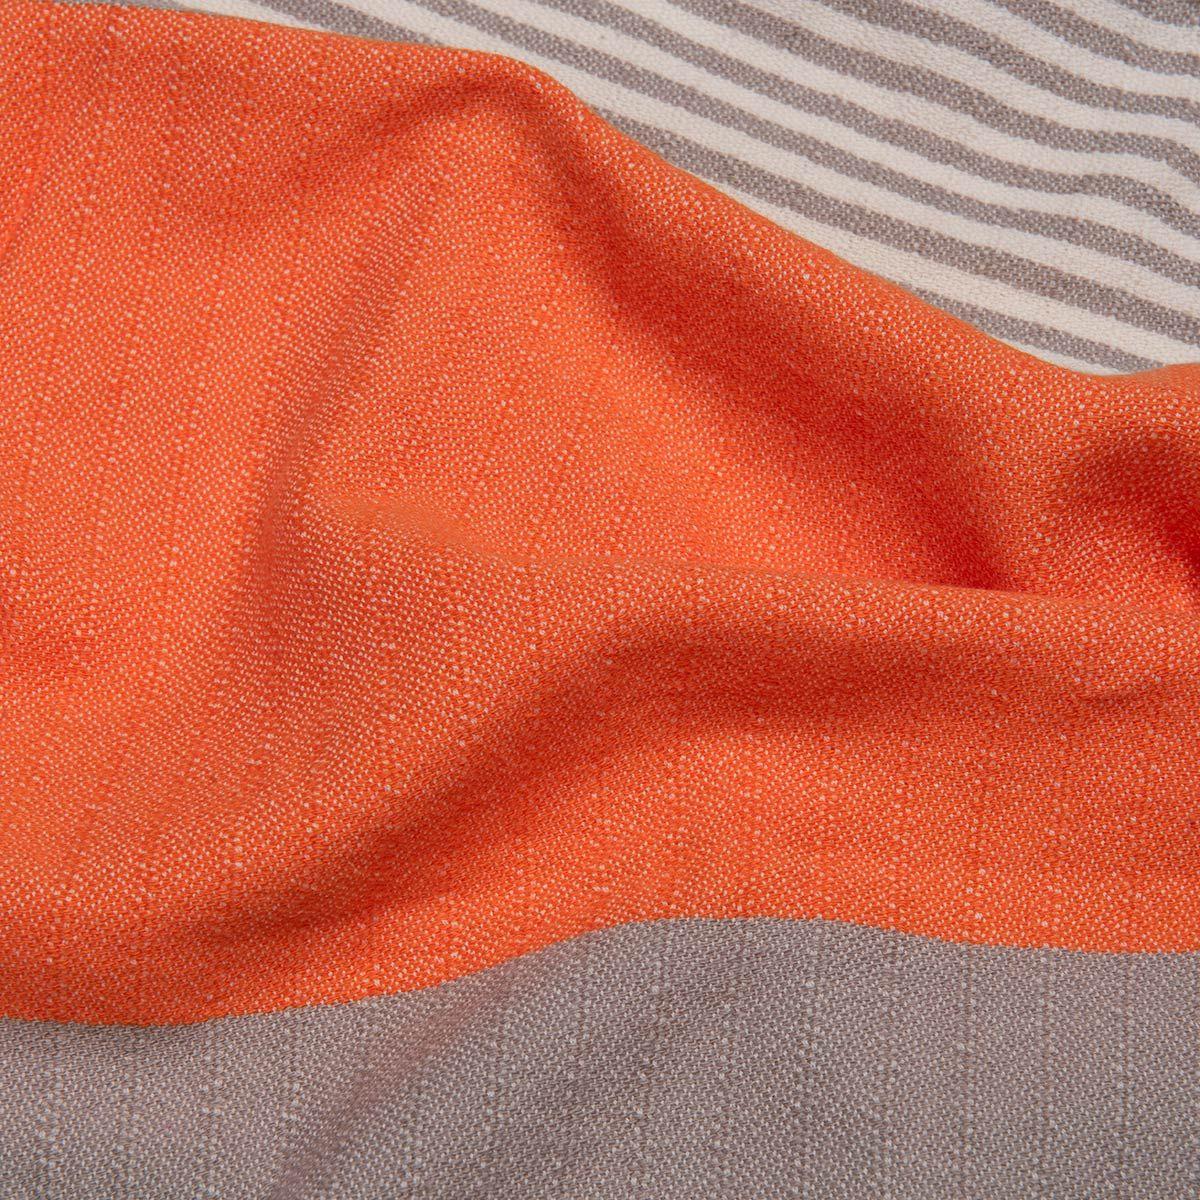 Peshtowel Twin Sultan - Taupe / Orange